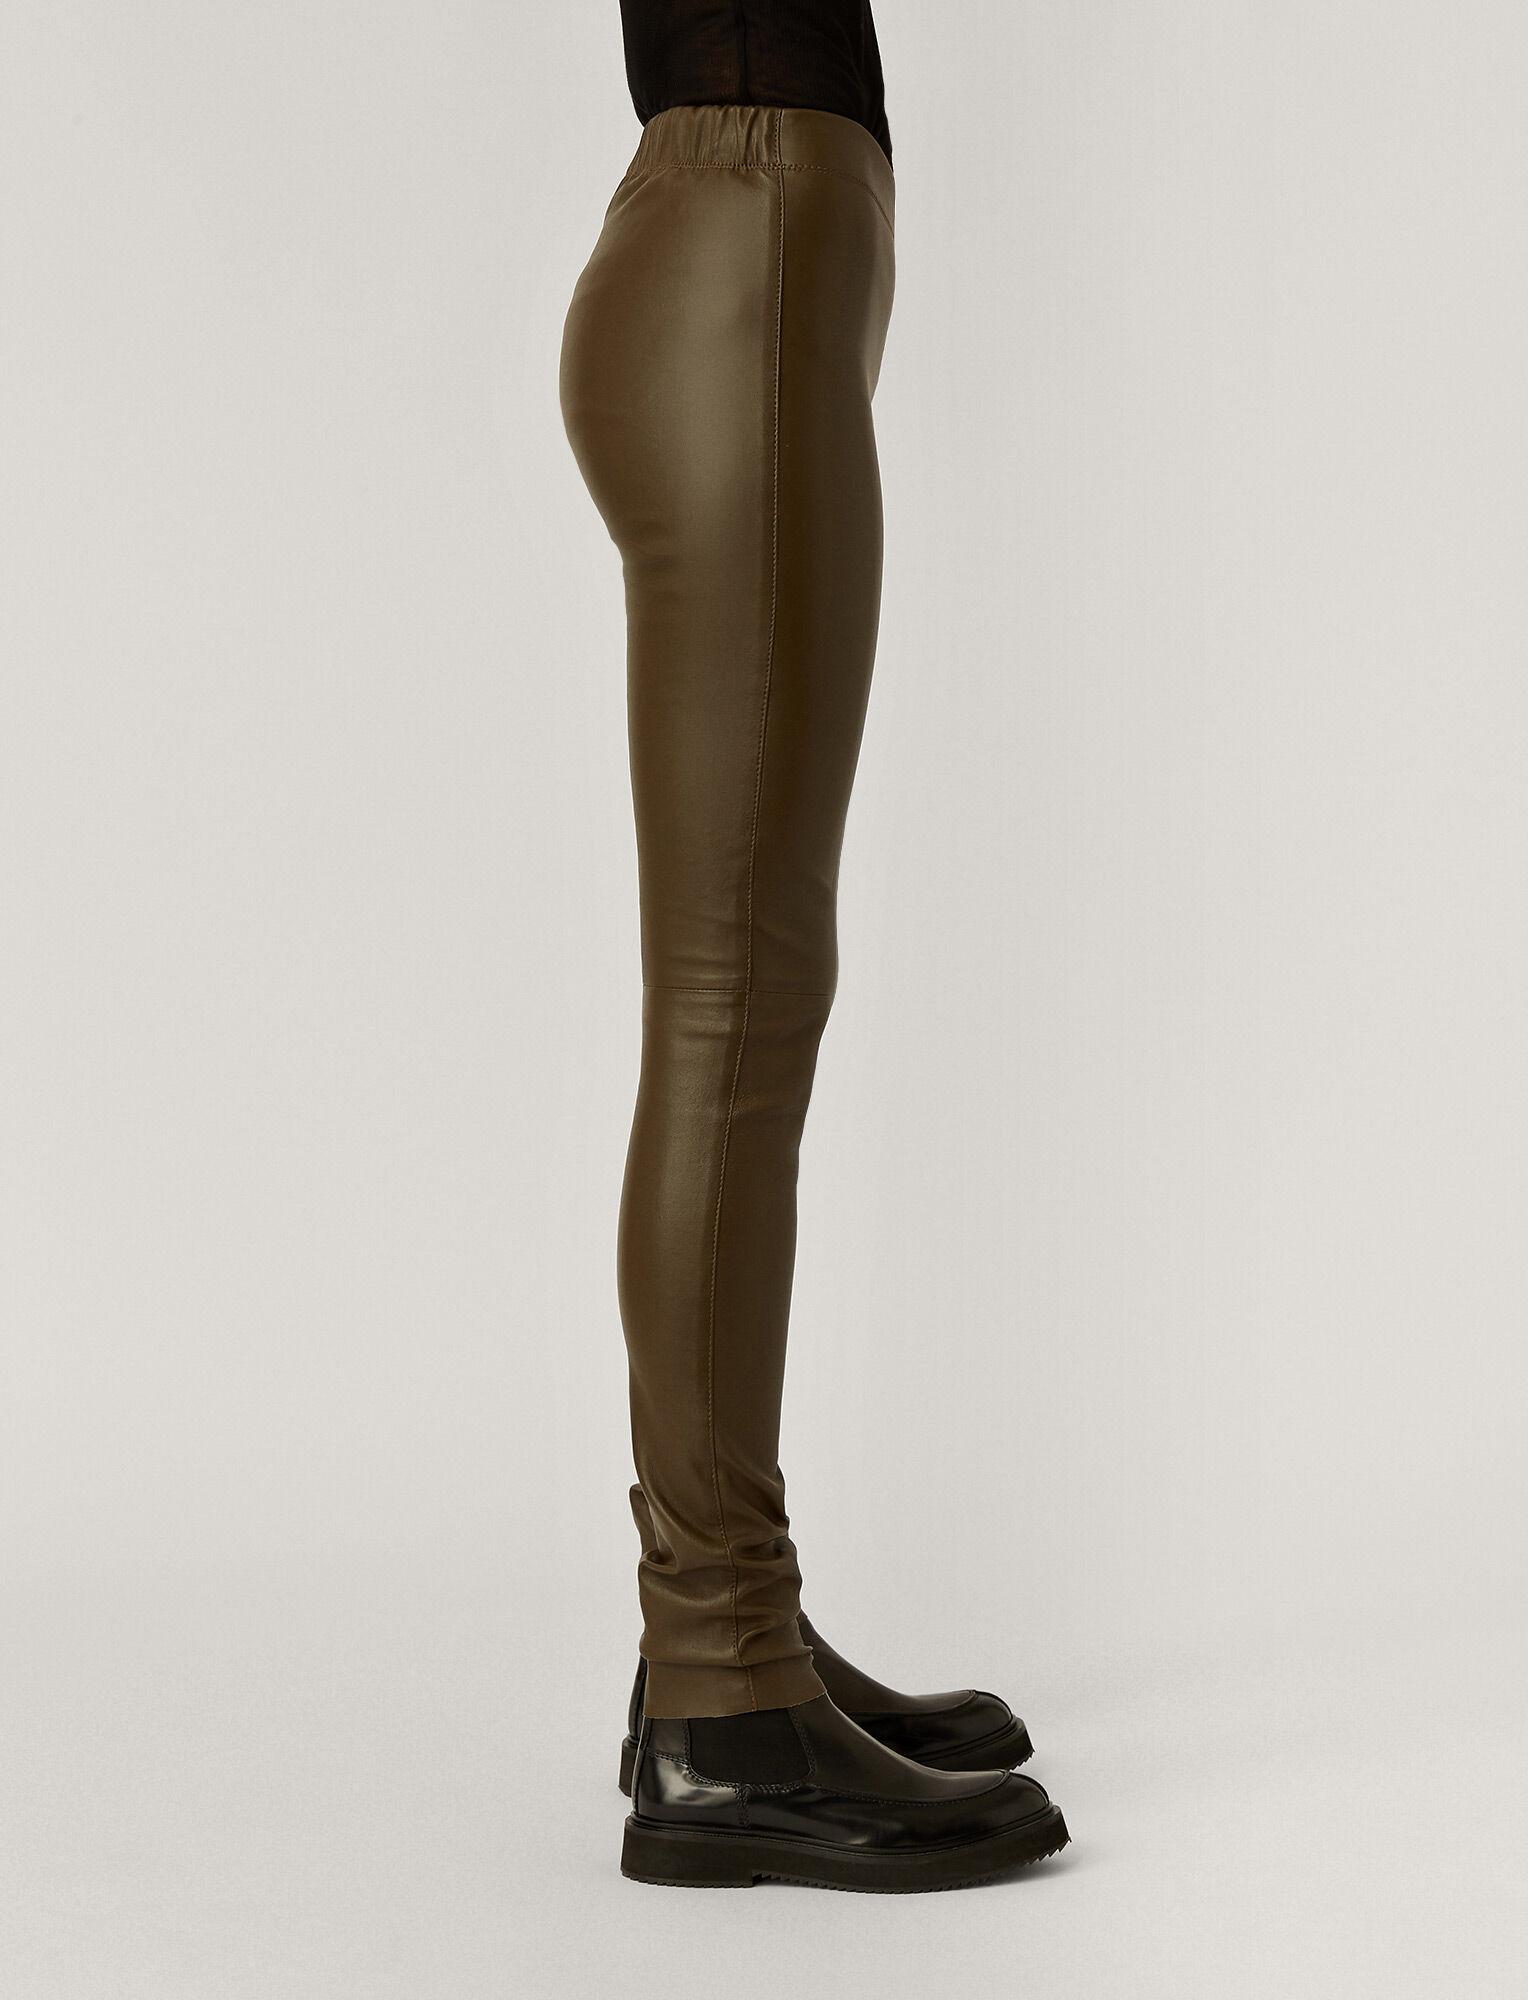 Joseph, Leather Stretch Legging, in Moss